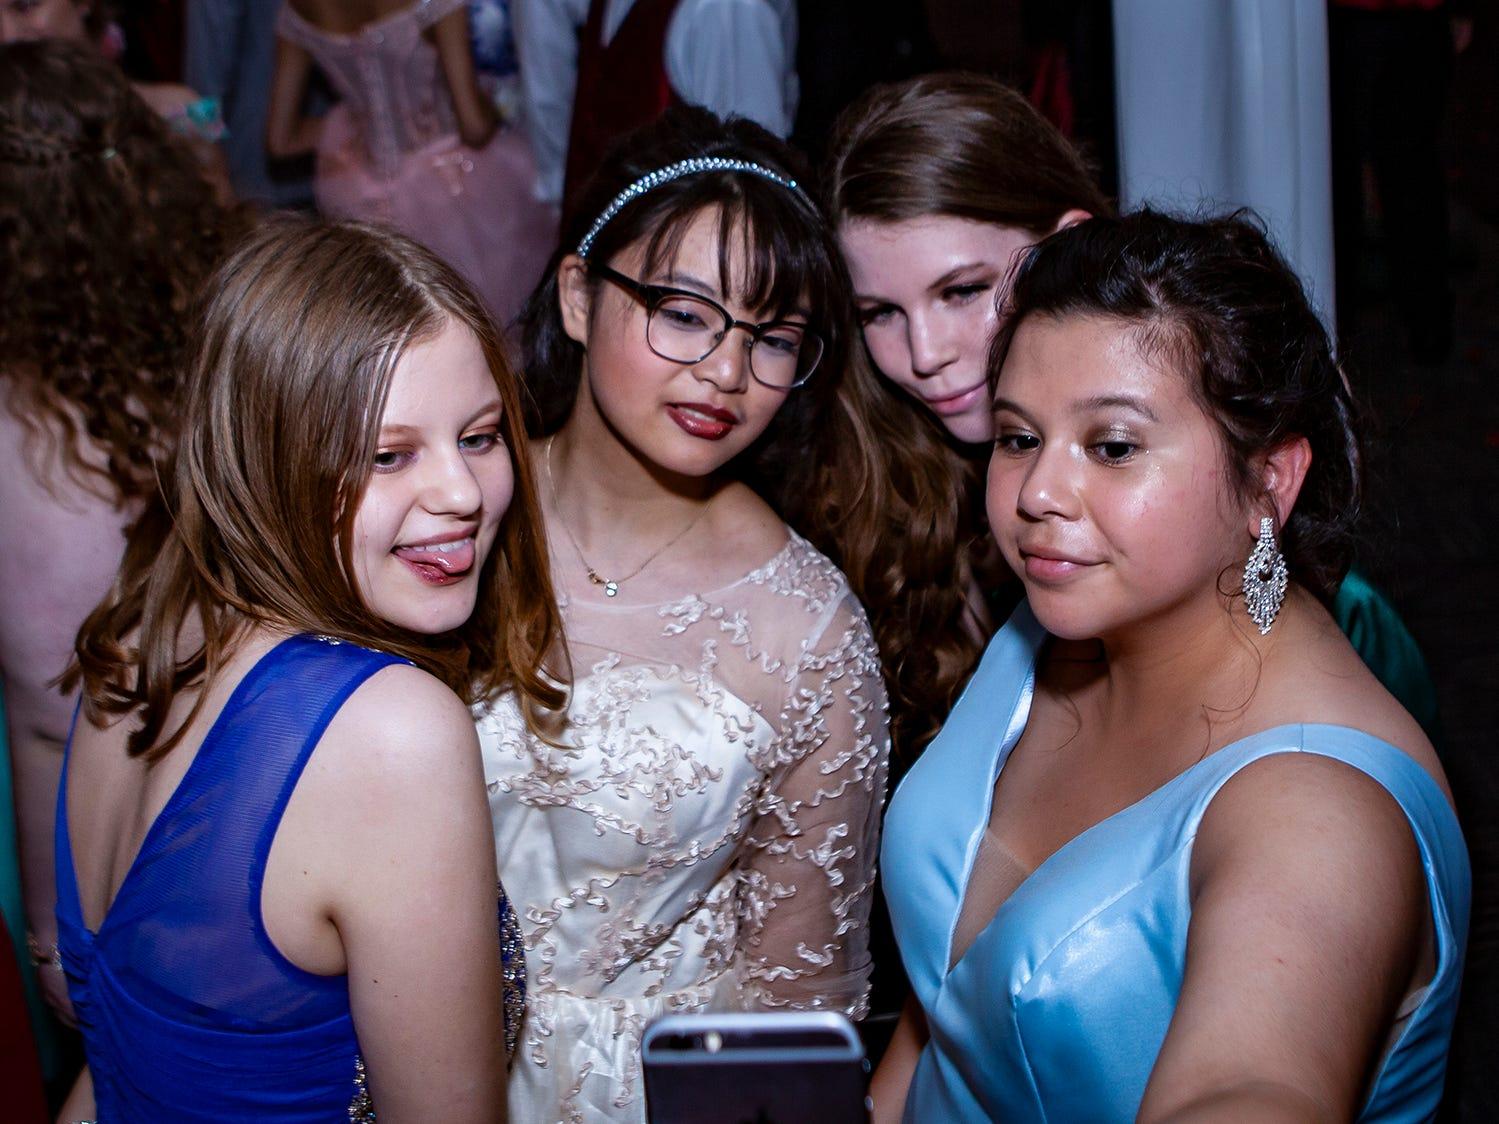 Lily Baumgartner, Aimee Zhang, Loren Kaler and Val Jurado snap a selfie at Riverdale's prom, held Saturday, April 27, 2019 at MTSU's Student Union Building.